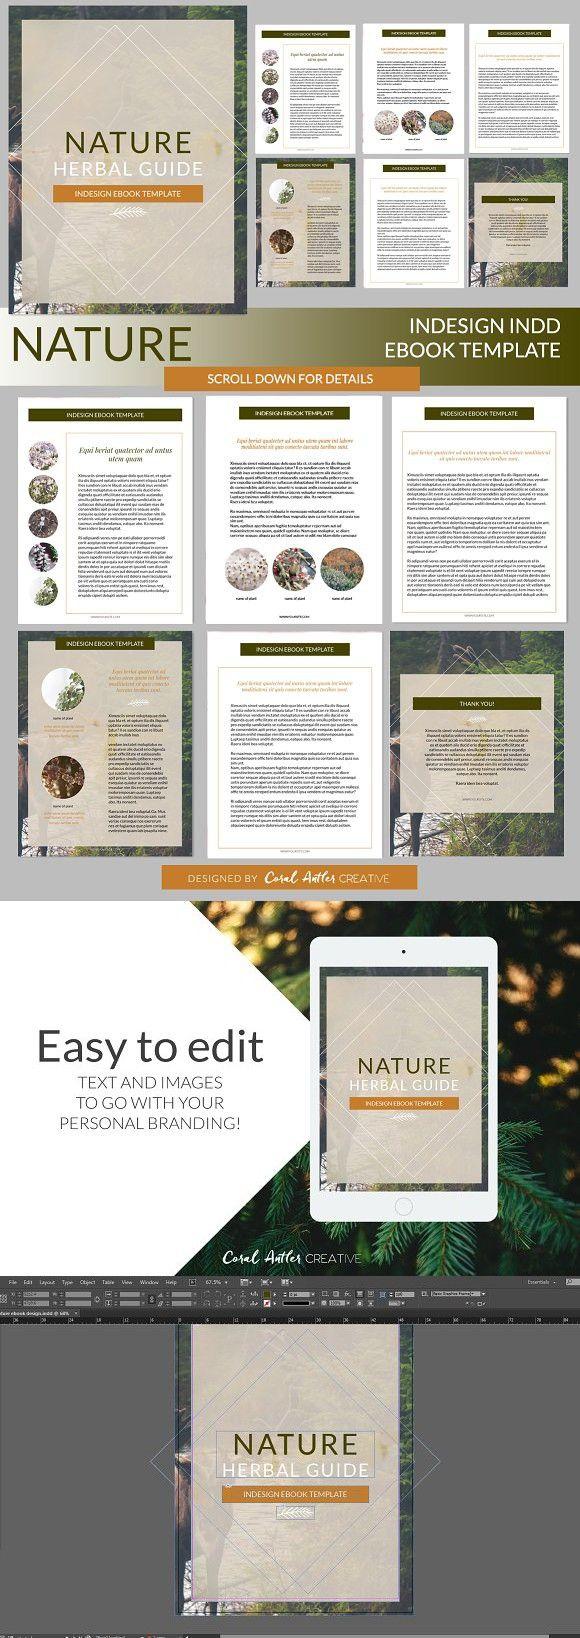 Nature indesign ebook template creative business card templates nature indesign ebook template creative business card templates flashek Choice Image